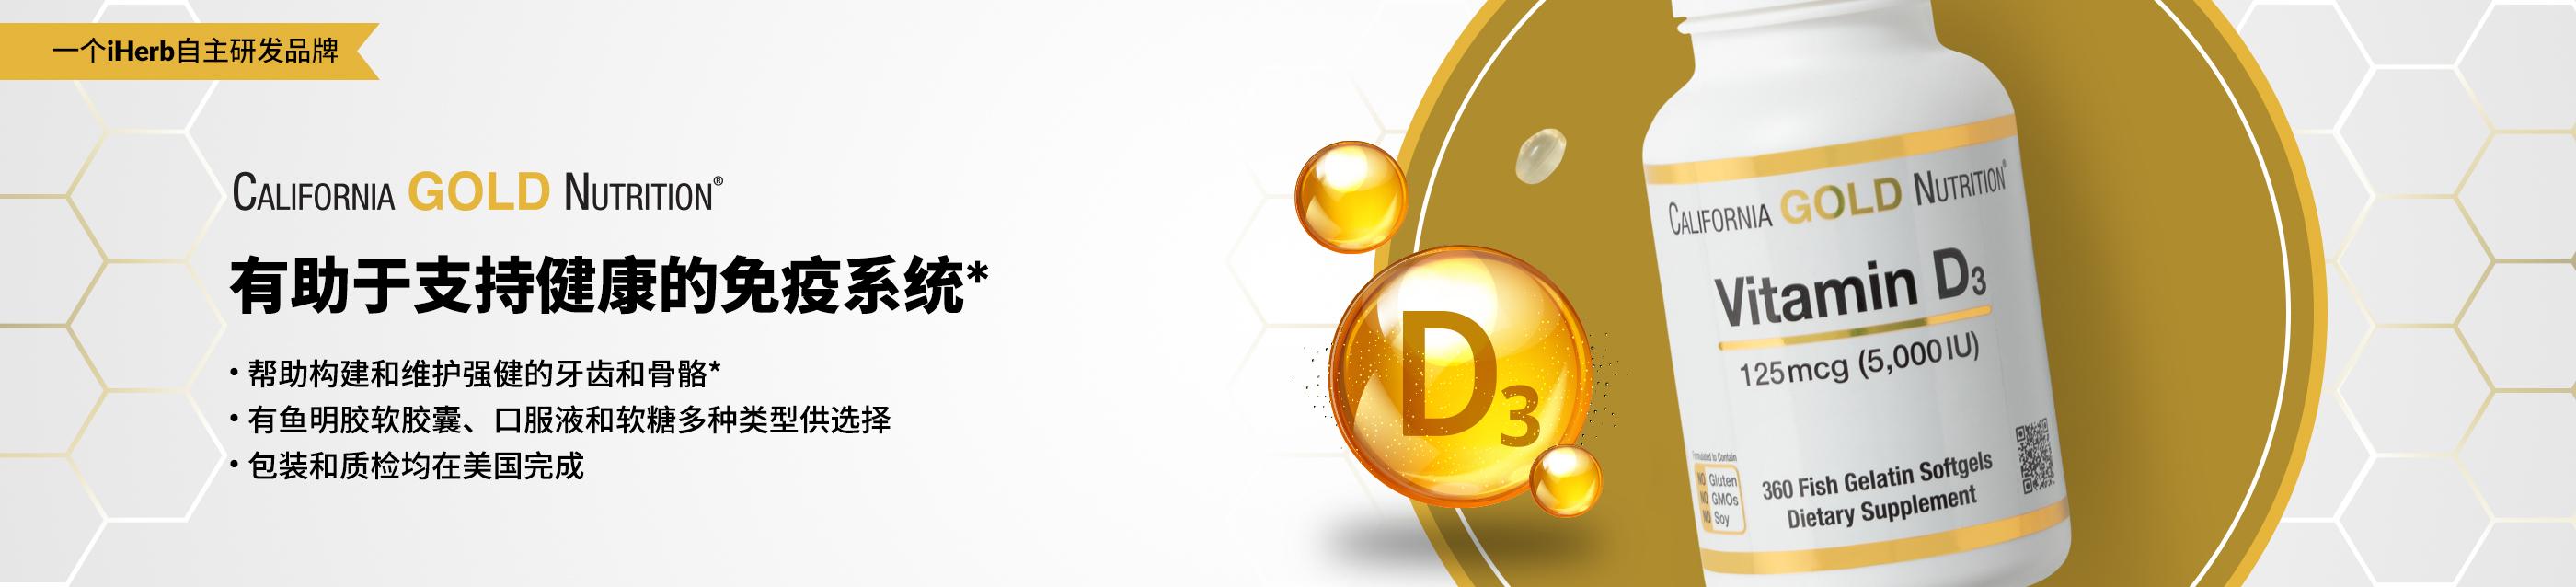 Cgn Vitamin D3